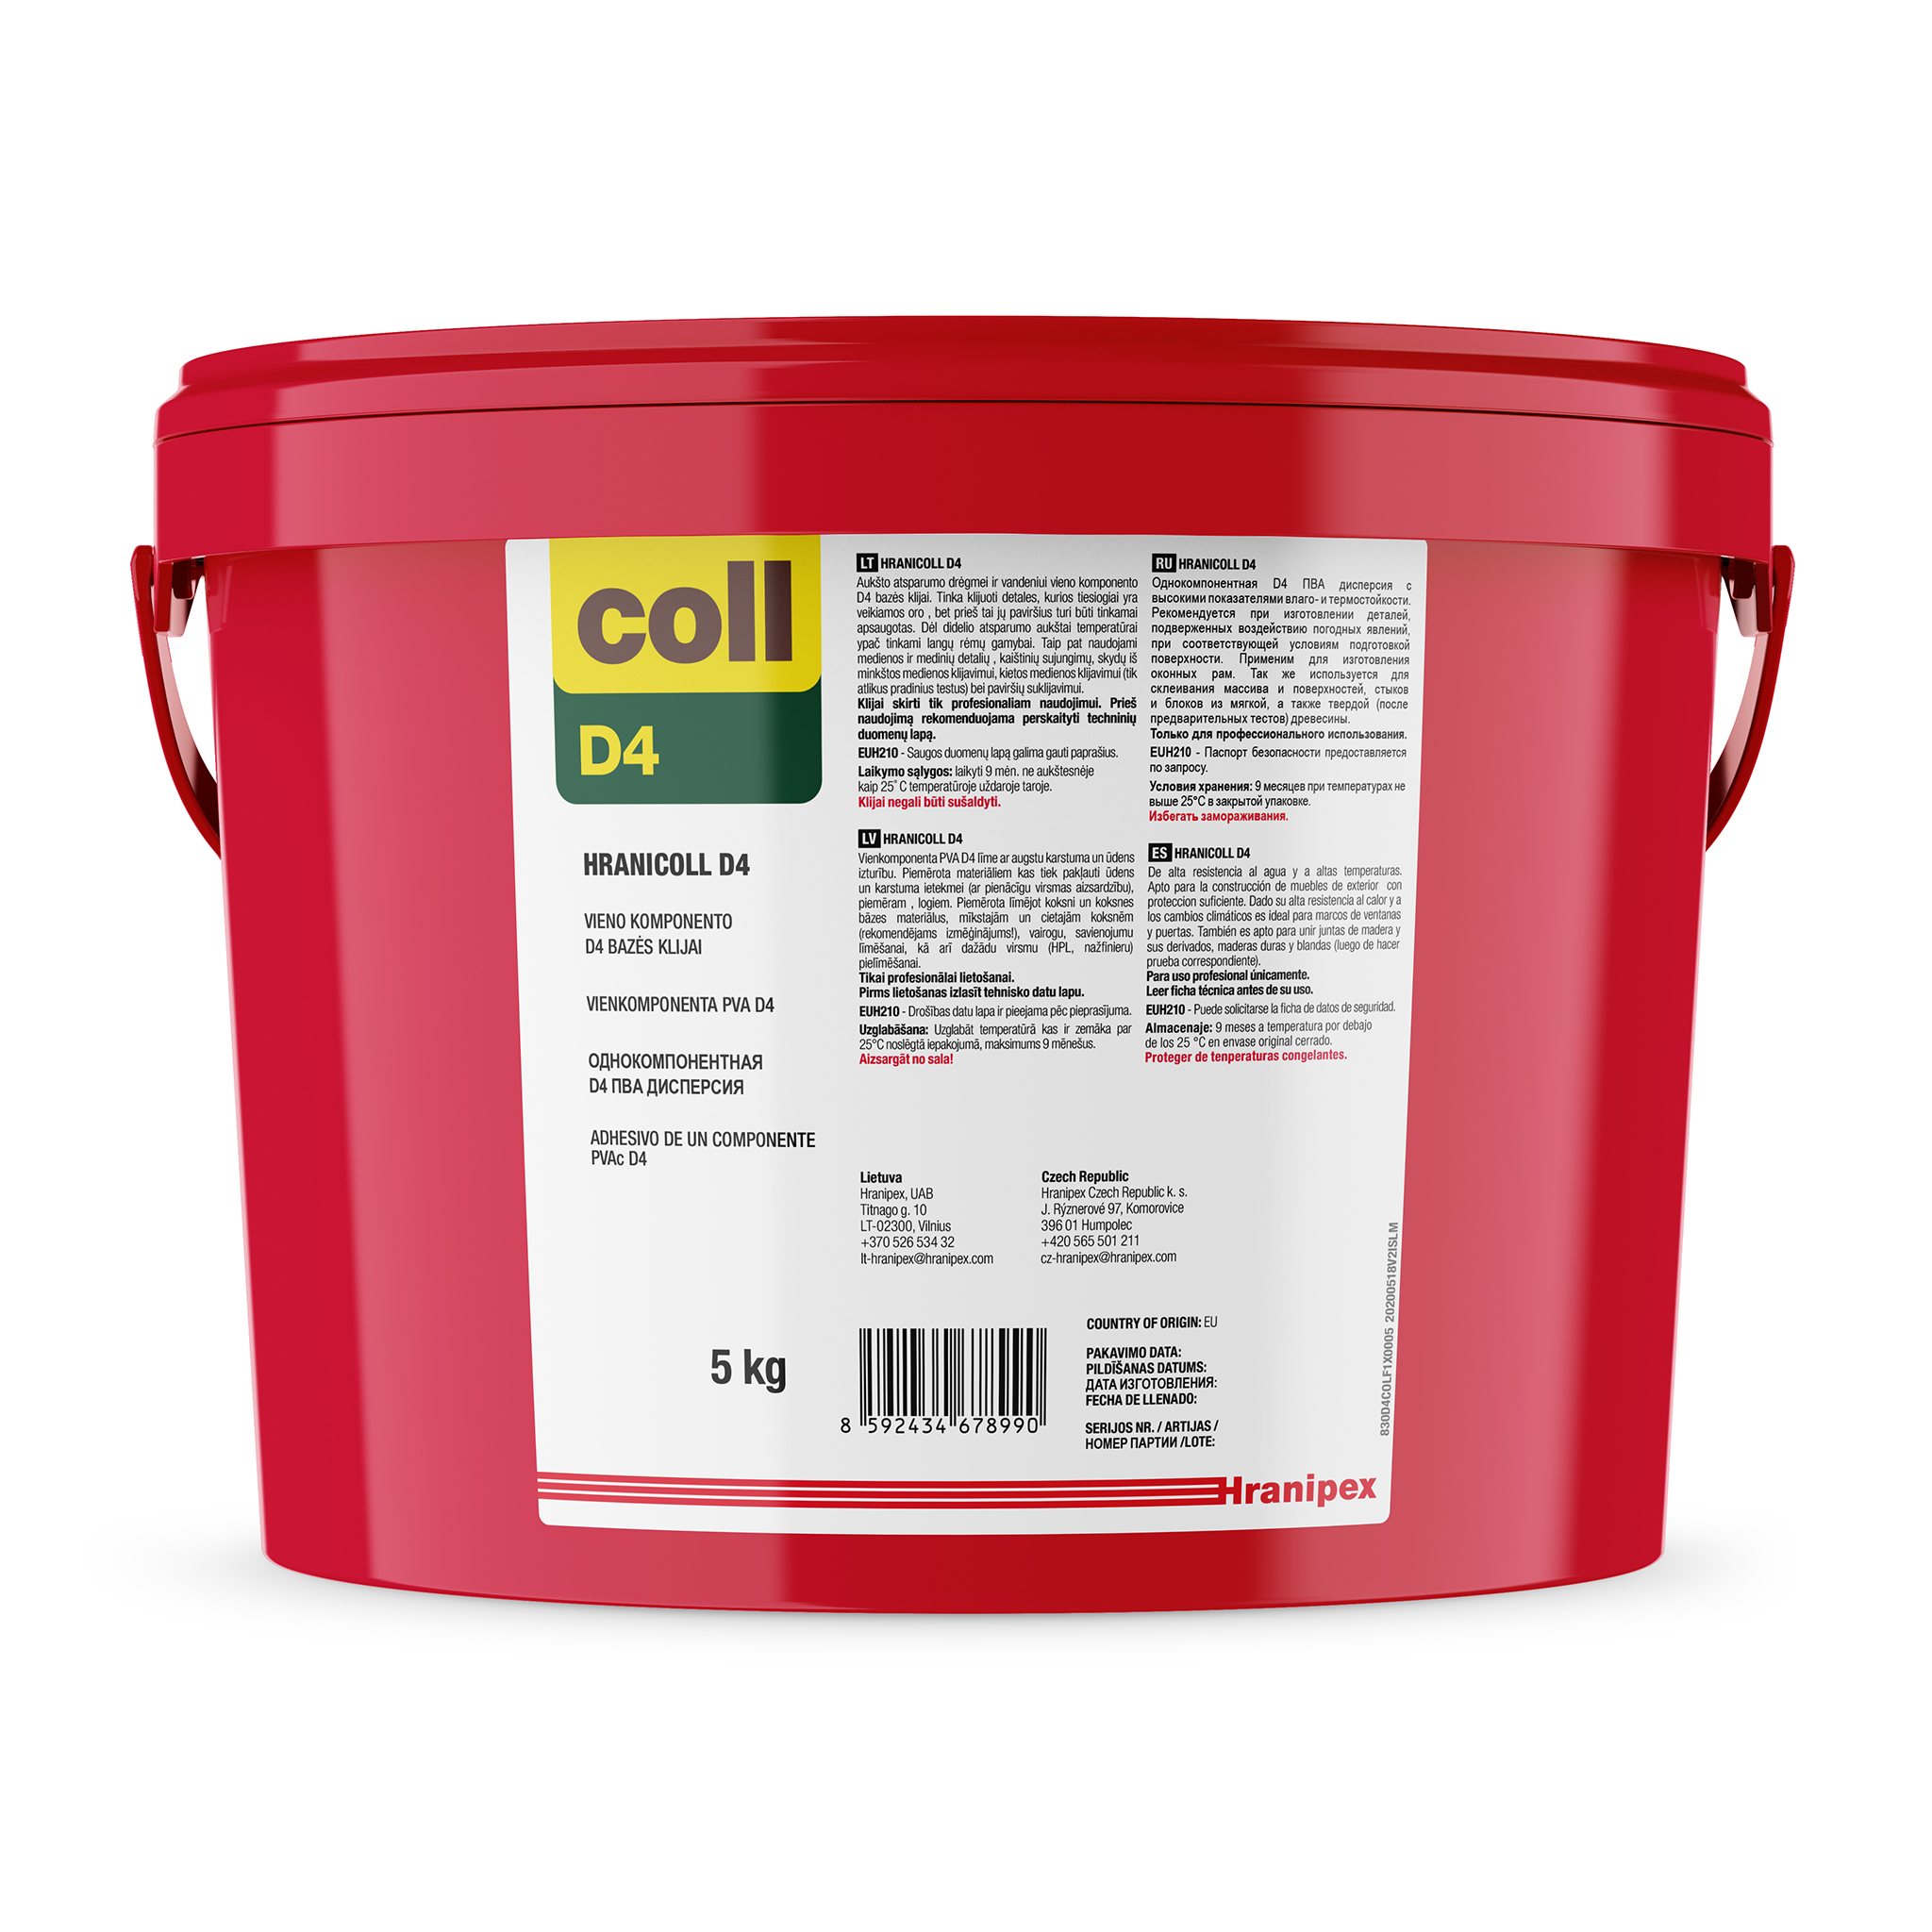 HRANICOLL D4 - PVAc Adhesivo dispersión 5 kg